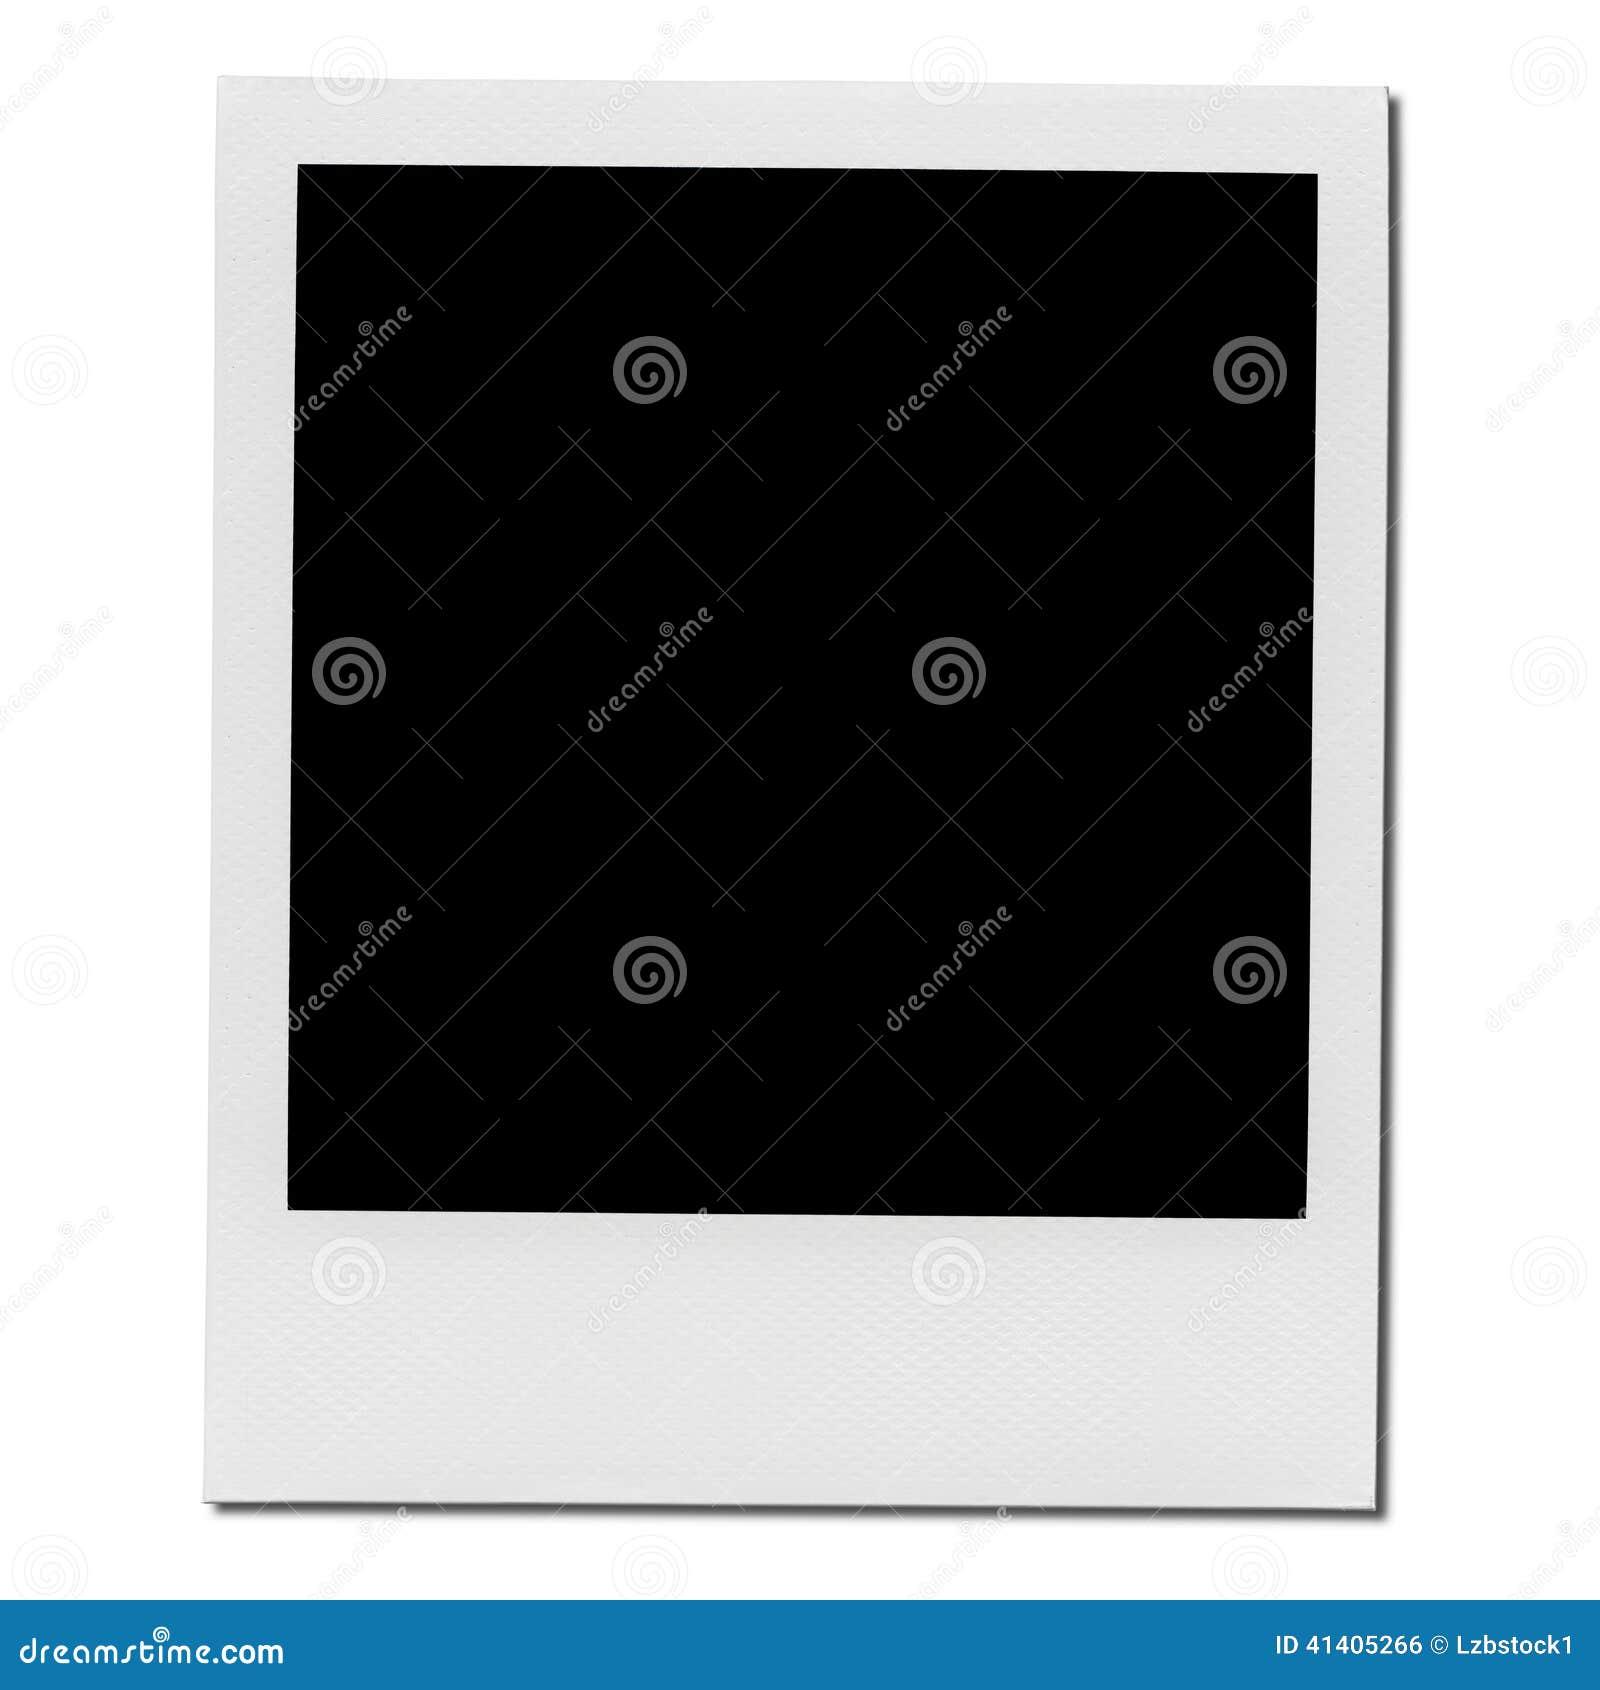 xxl cadre polaro d vide de photo photo stock image. Black Bedroom Furniture Sets. Home Design Ideas